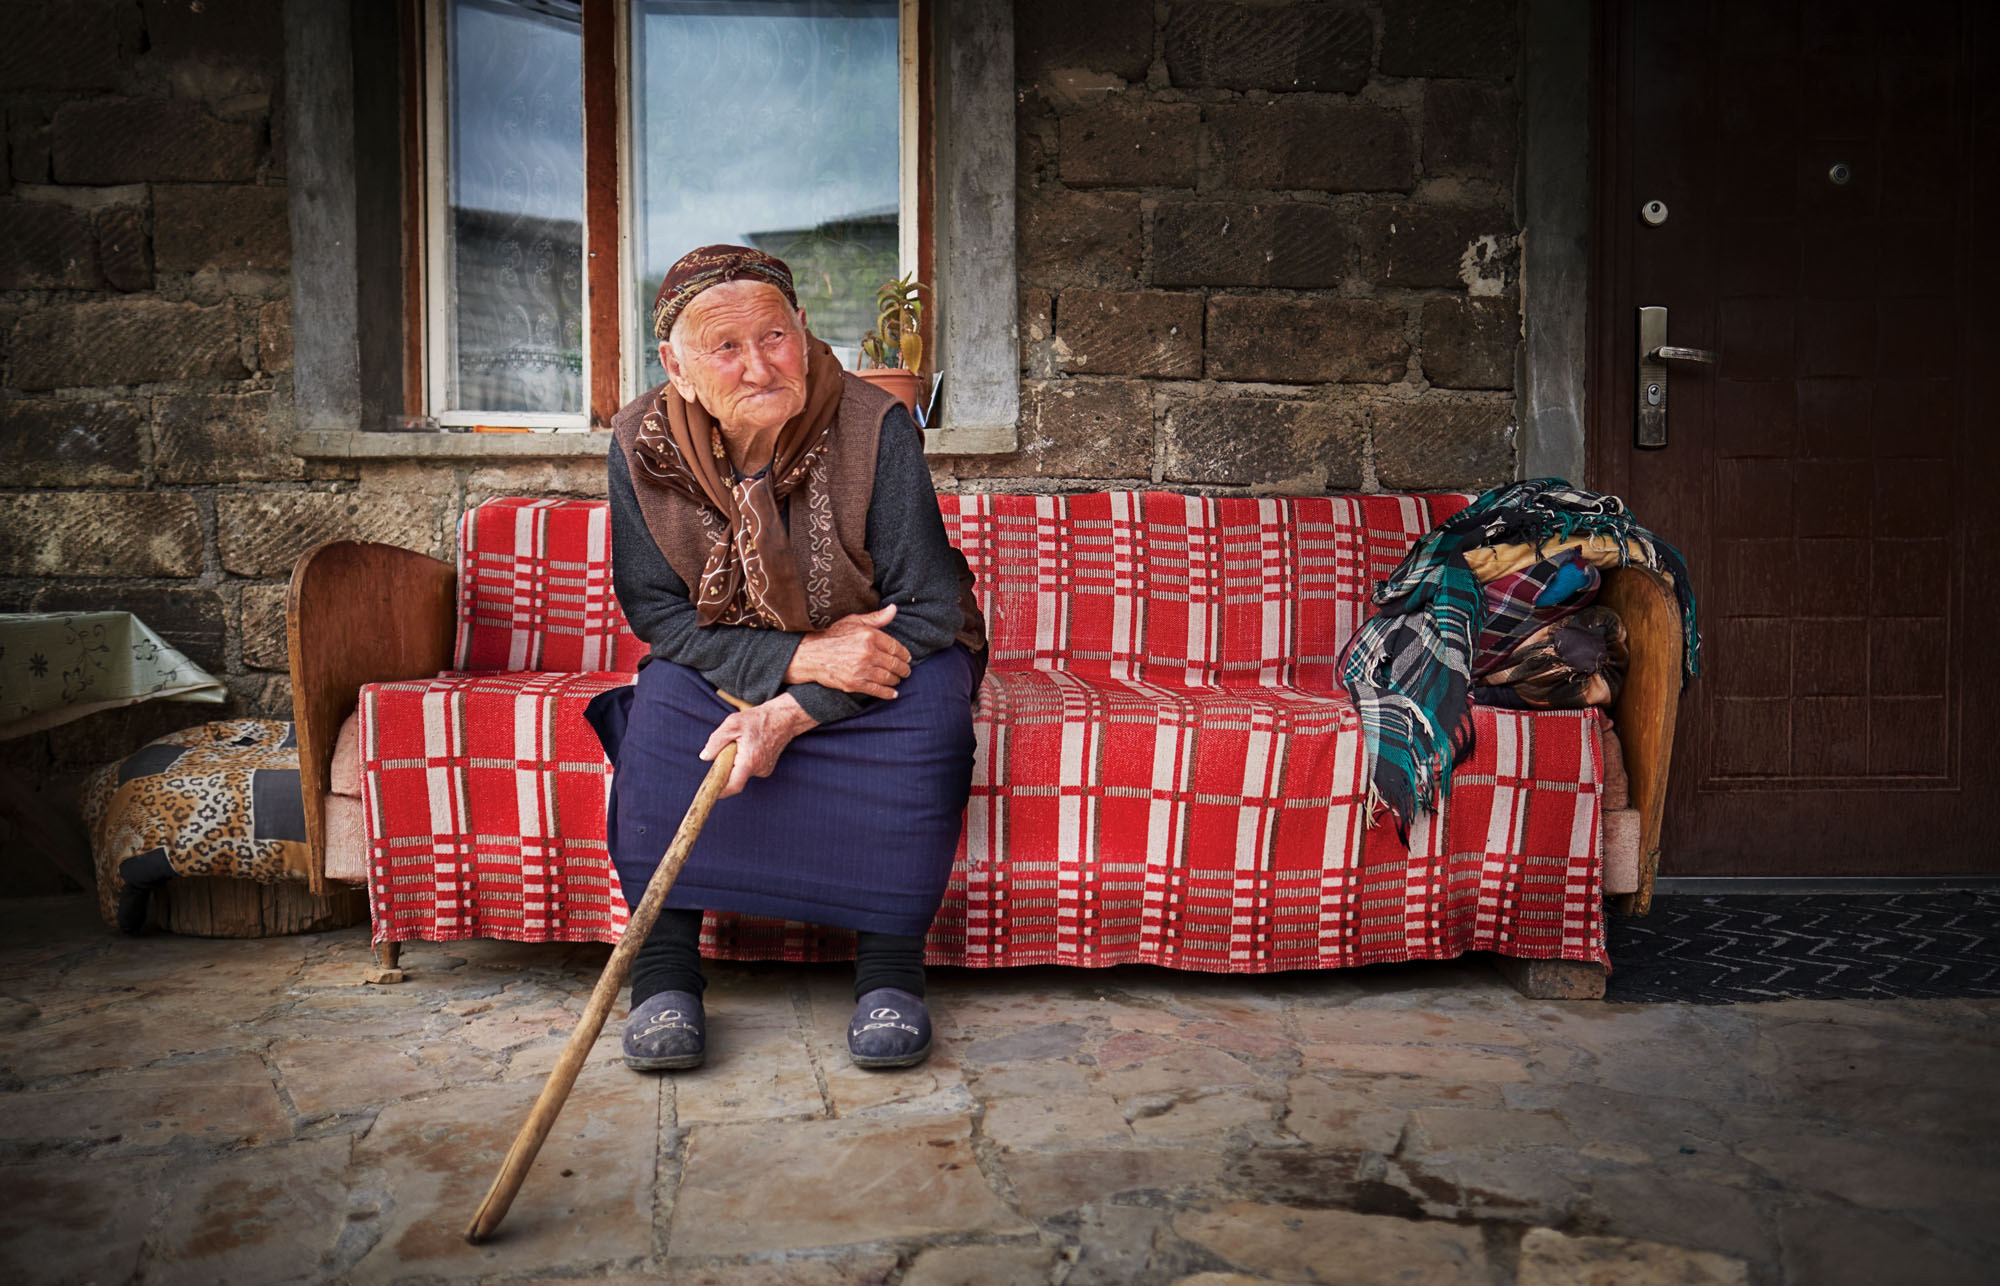 Village Elder, Areni, Armenia. Fujifilm X-Pro2, 16mm, f1.4 @ 1/4400 second, ISO 200.